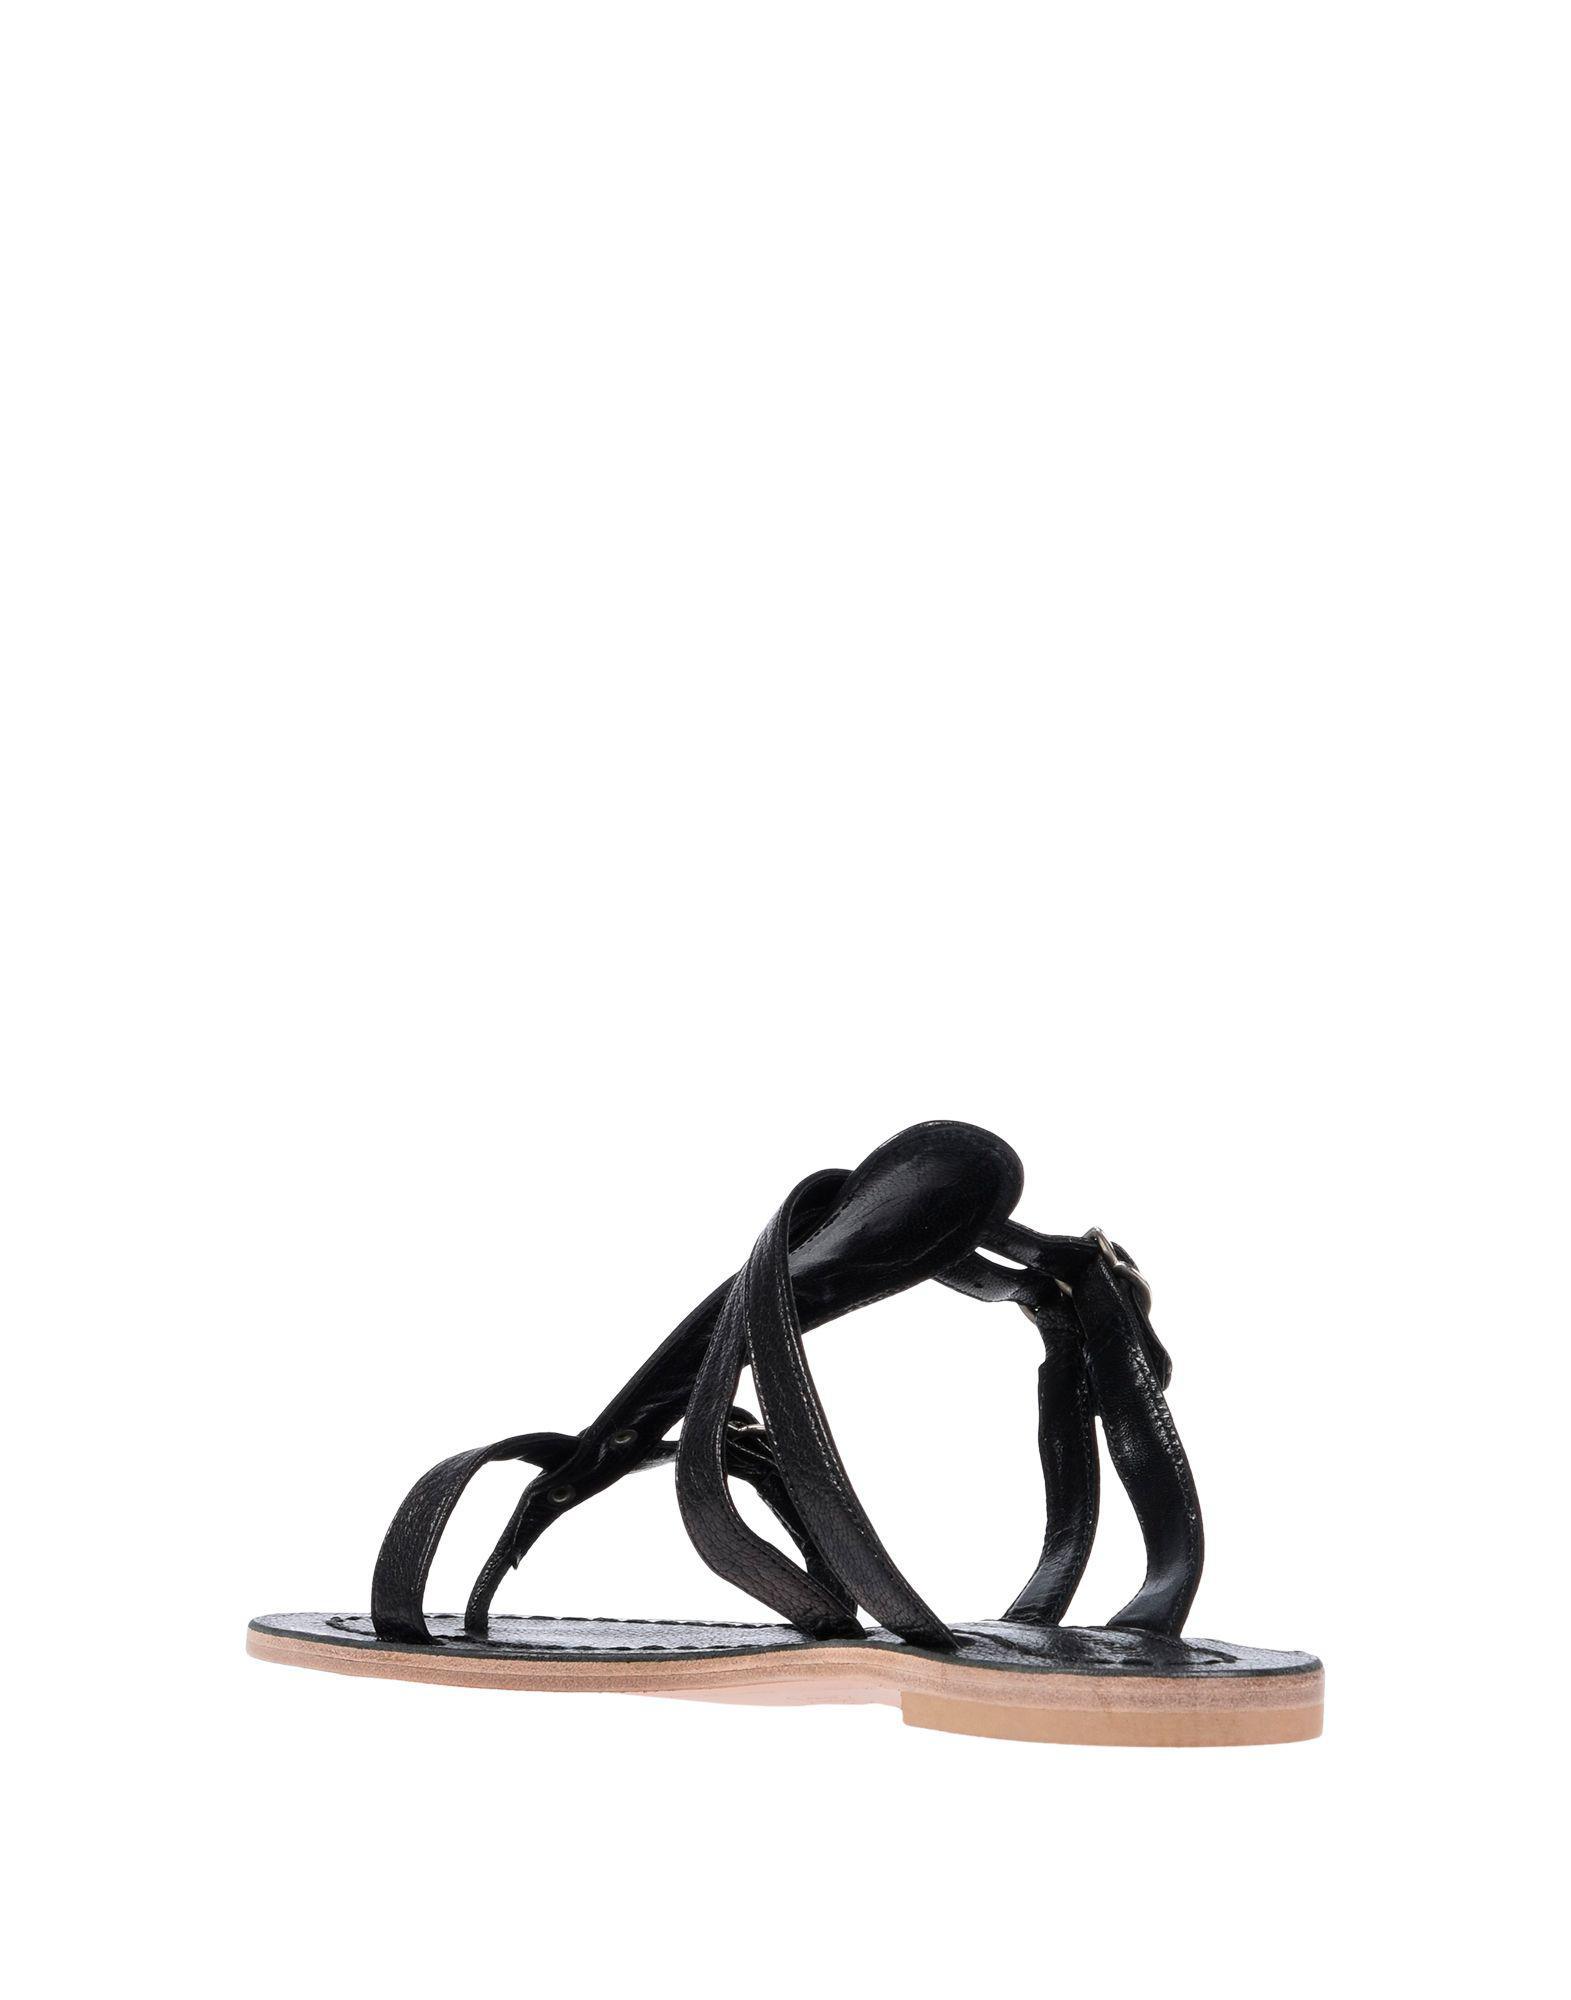 1d108fde24ea Lyst - Sigerson Morrison Toe Strap Sandal in Black